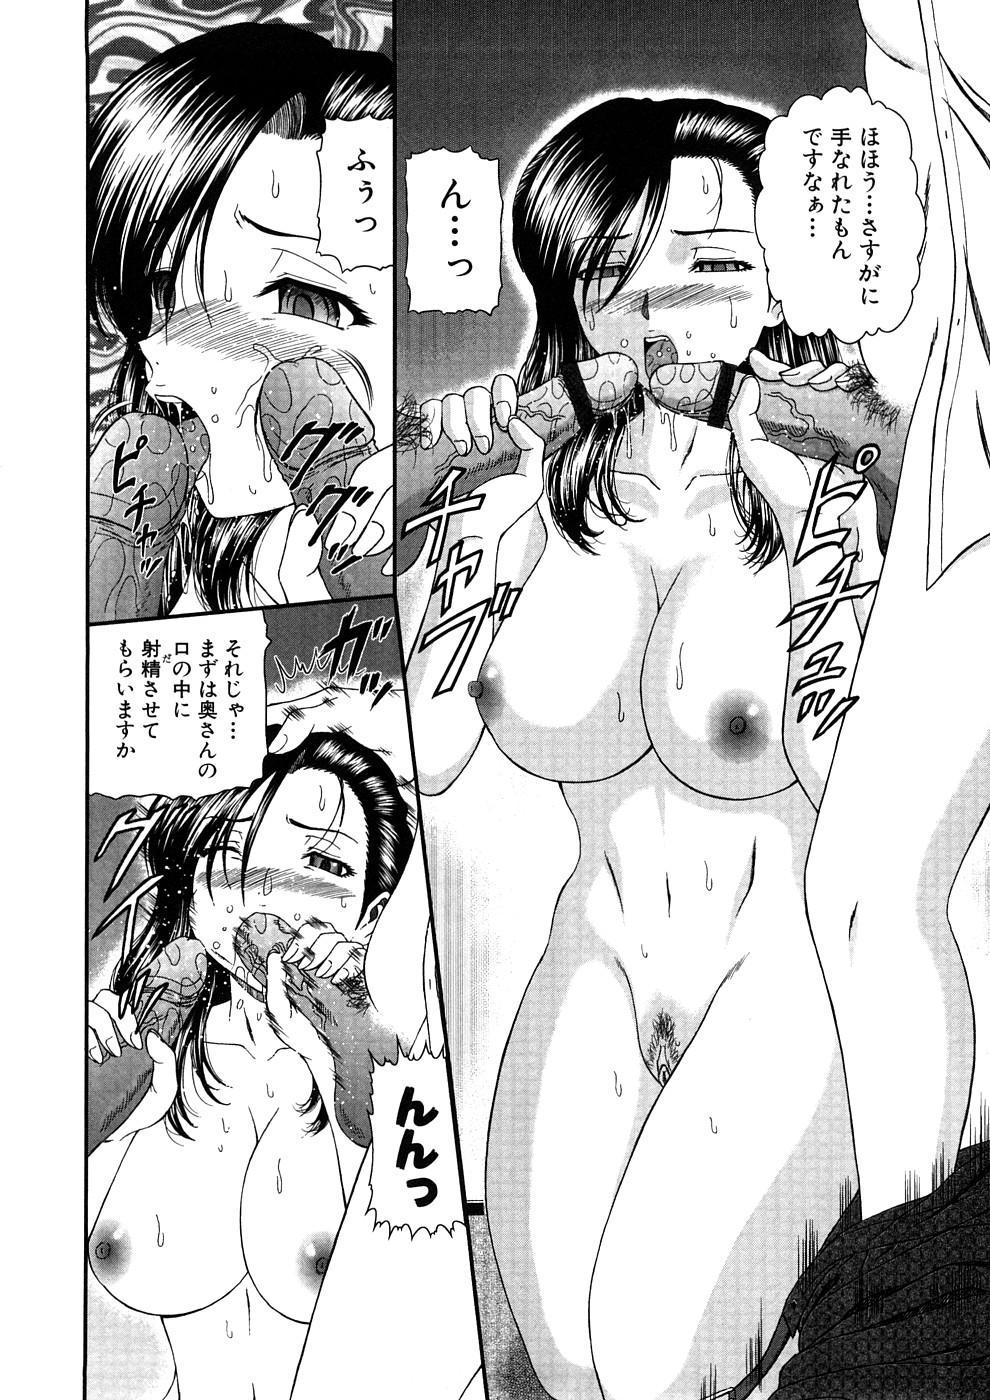 Geki Yaba Anthology Vol. 1 - Naka ni Dashite yo 146